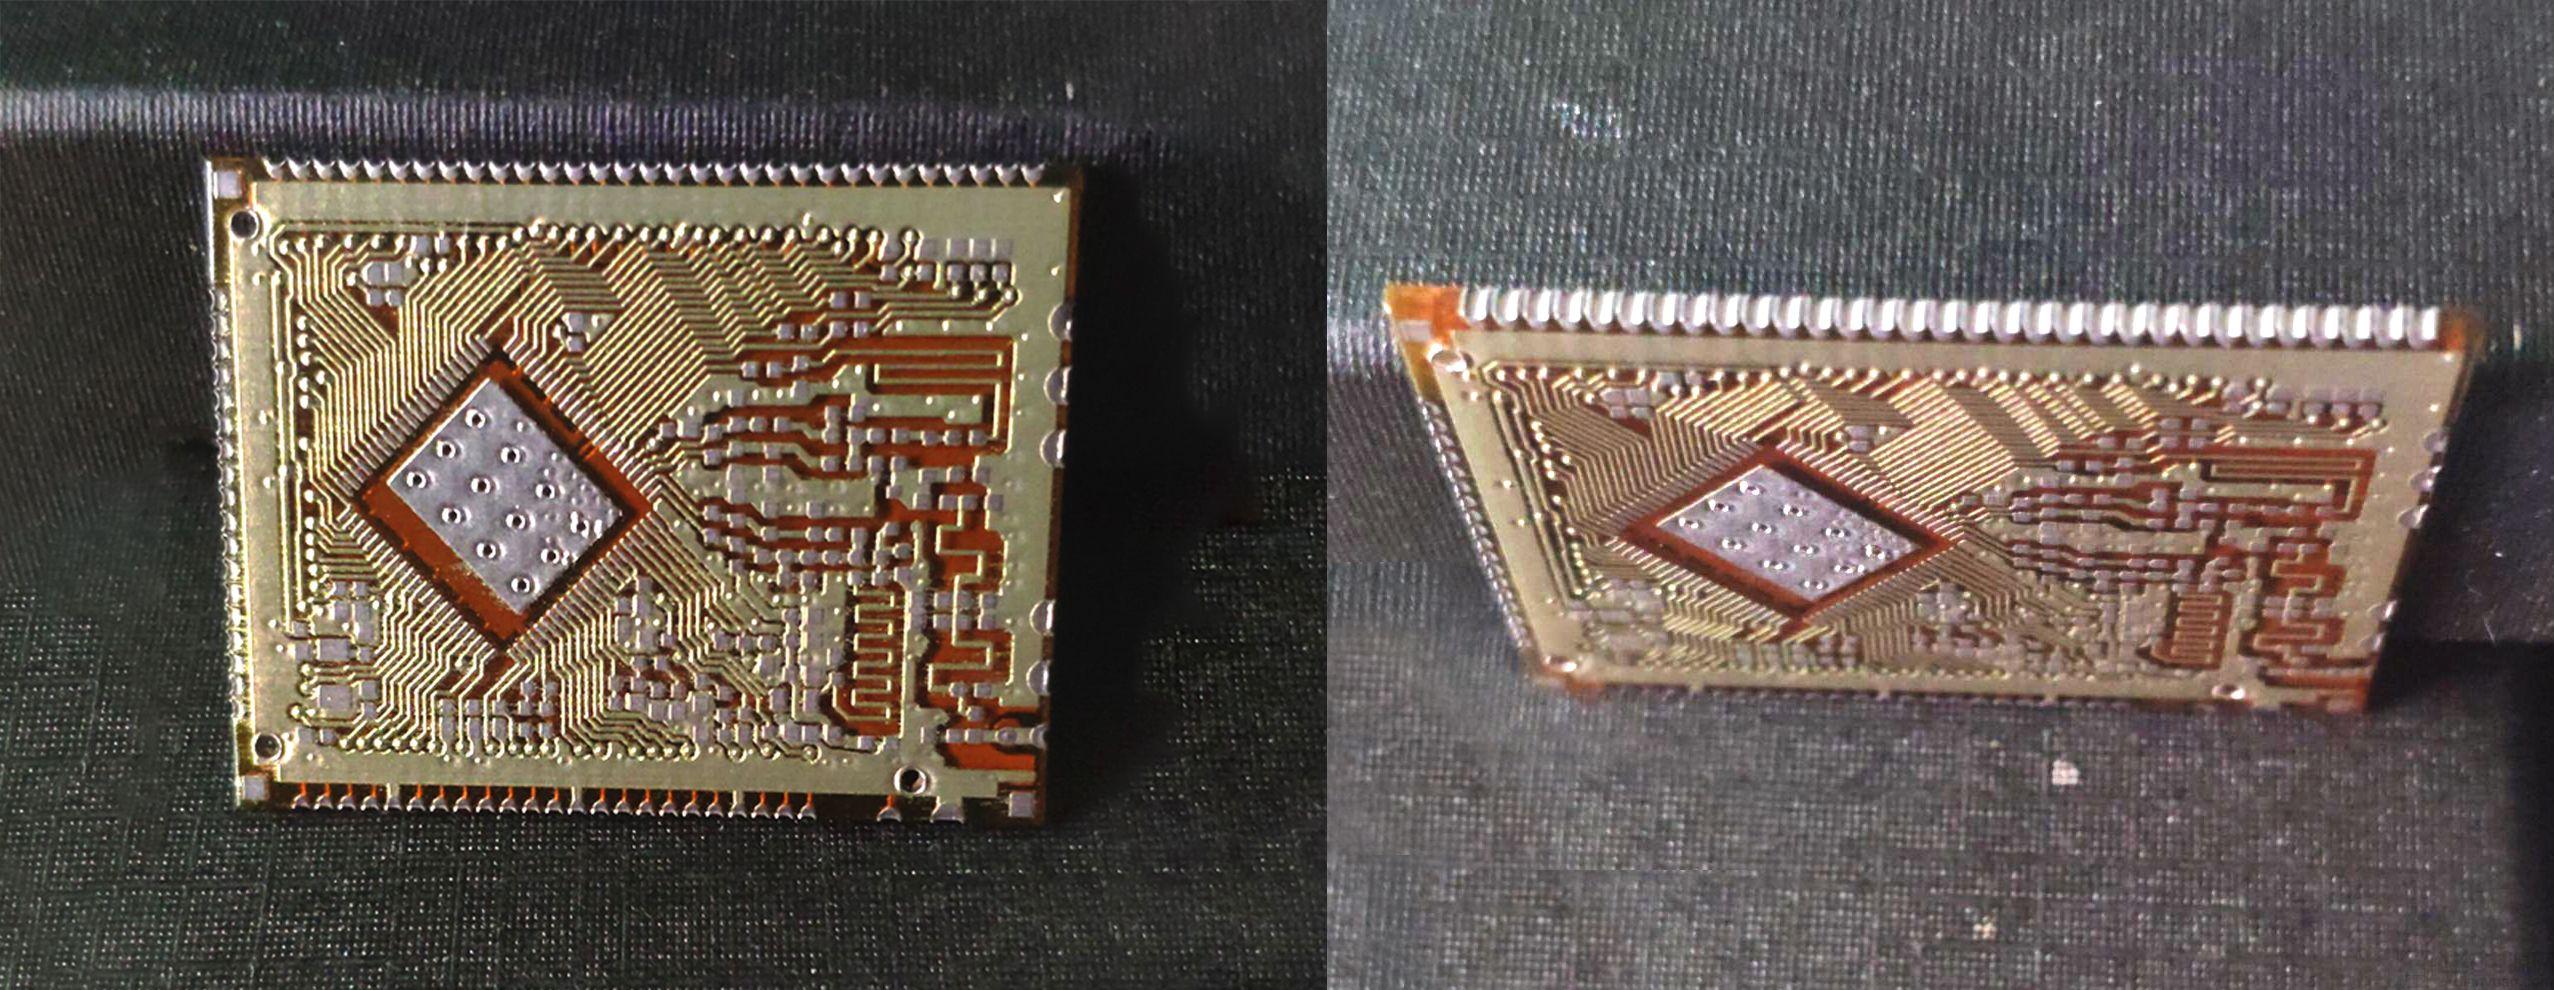 Nano Dimension 3D 打印电路板侧装技术